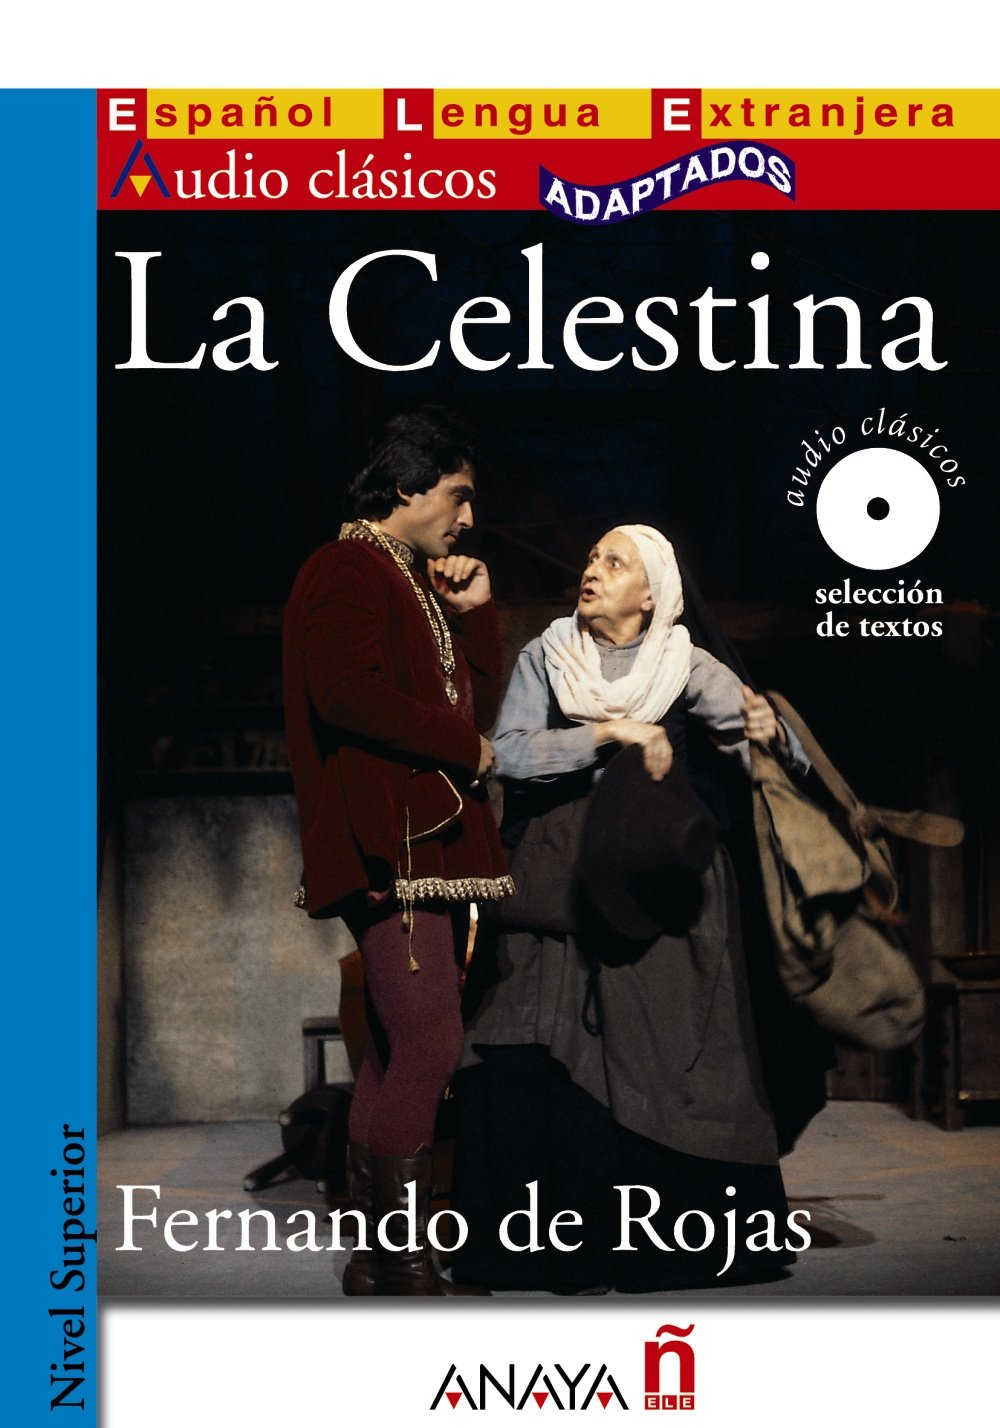 La Celestina (Audio clasicos adaptados: Nivel Superior / Audio Classics Adapted: Higher Level) (Spanish Edition) by Brand: Anaya ELE